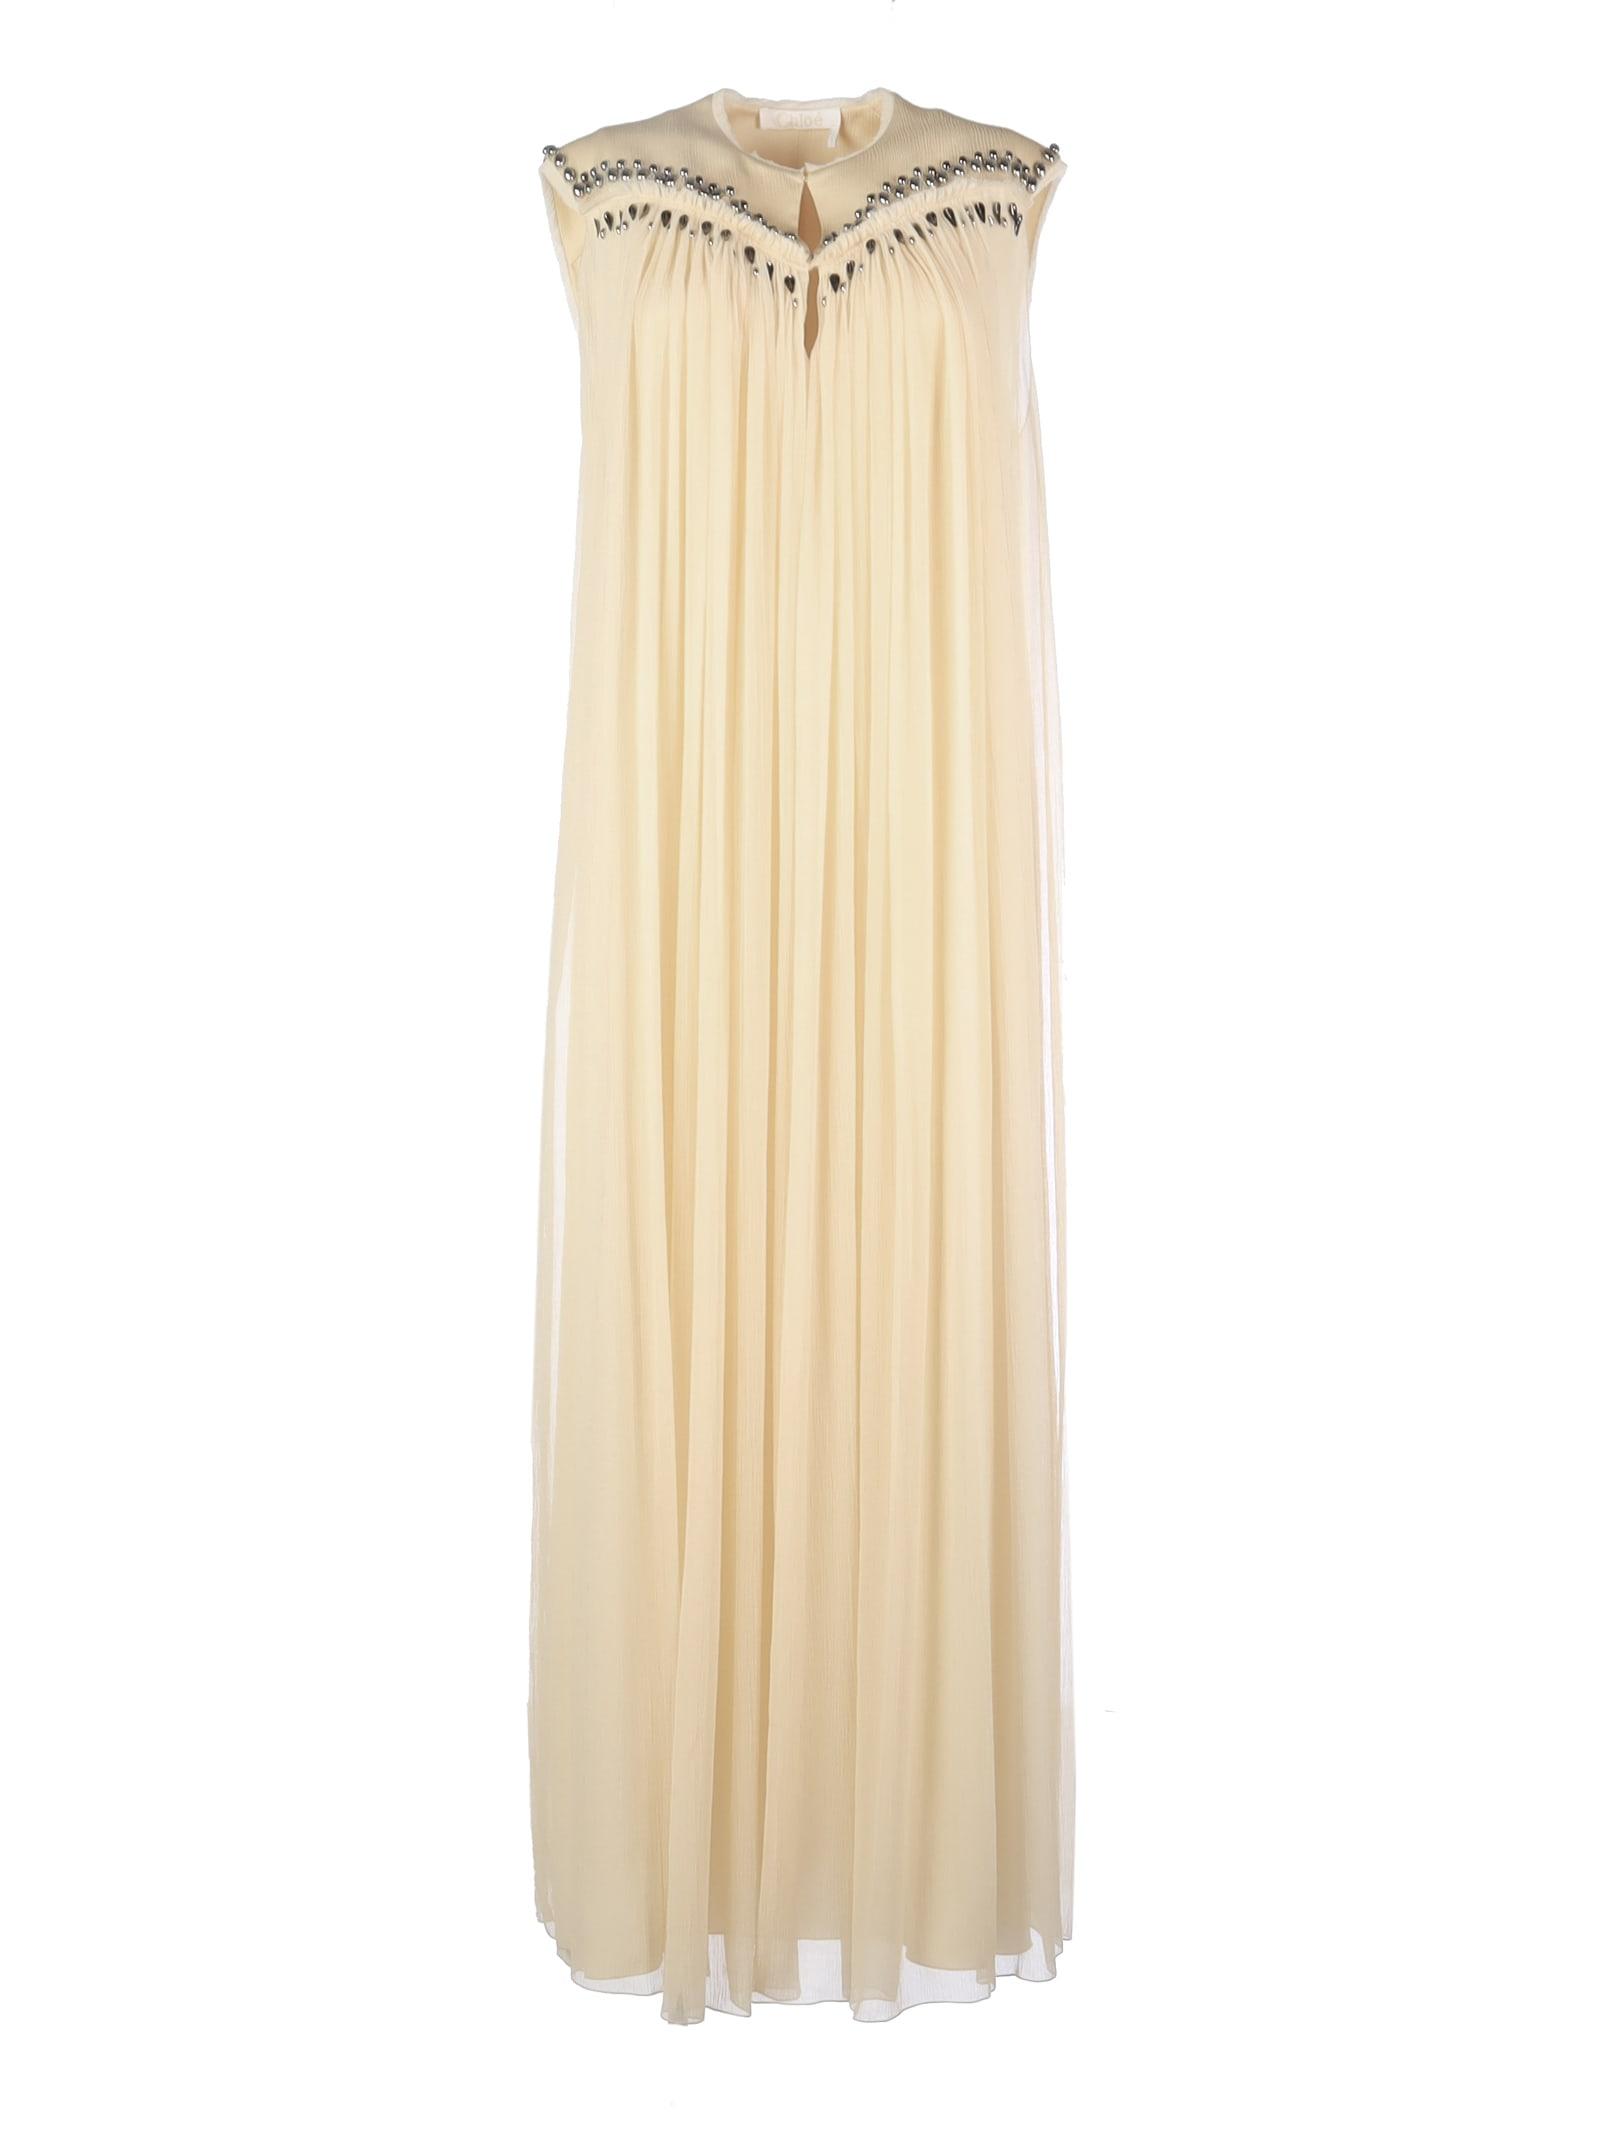 Chloé Long Plisse Cotton Dress